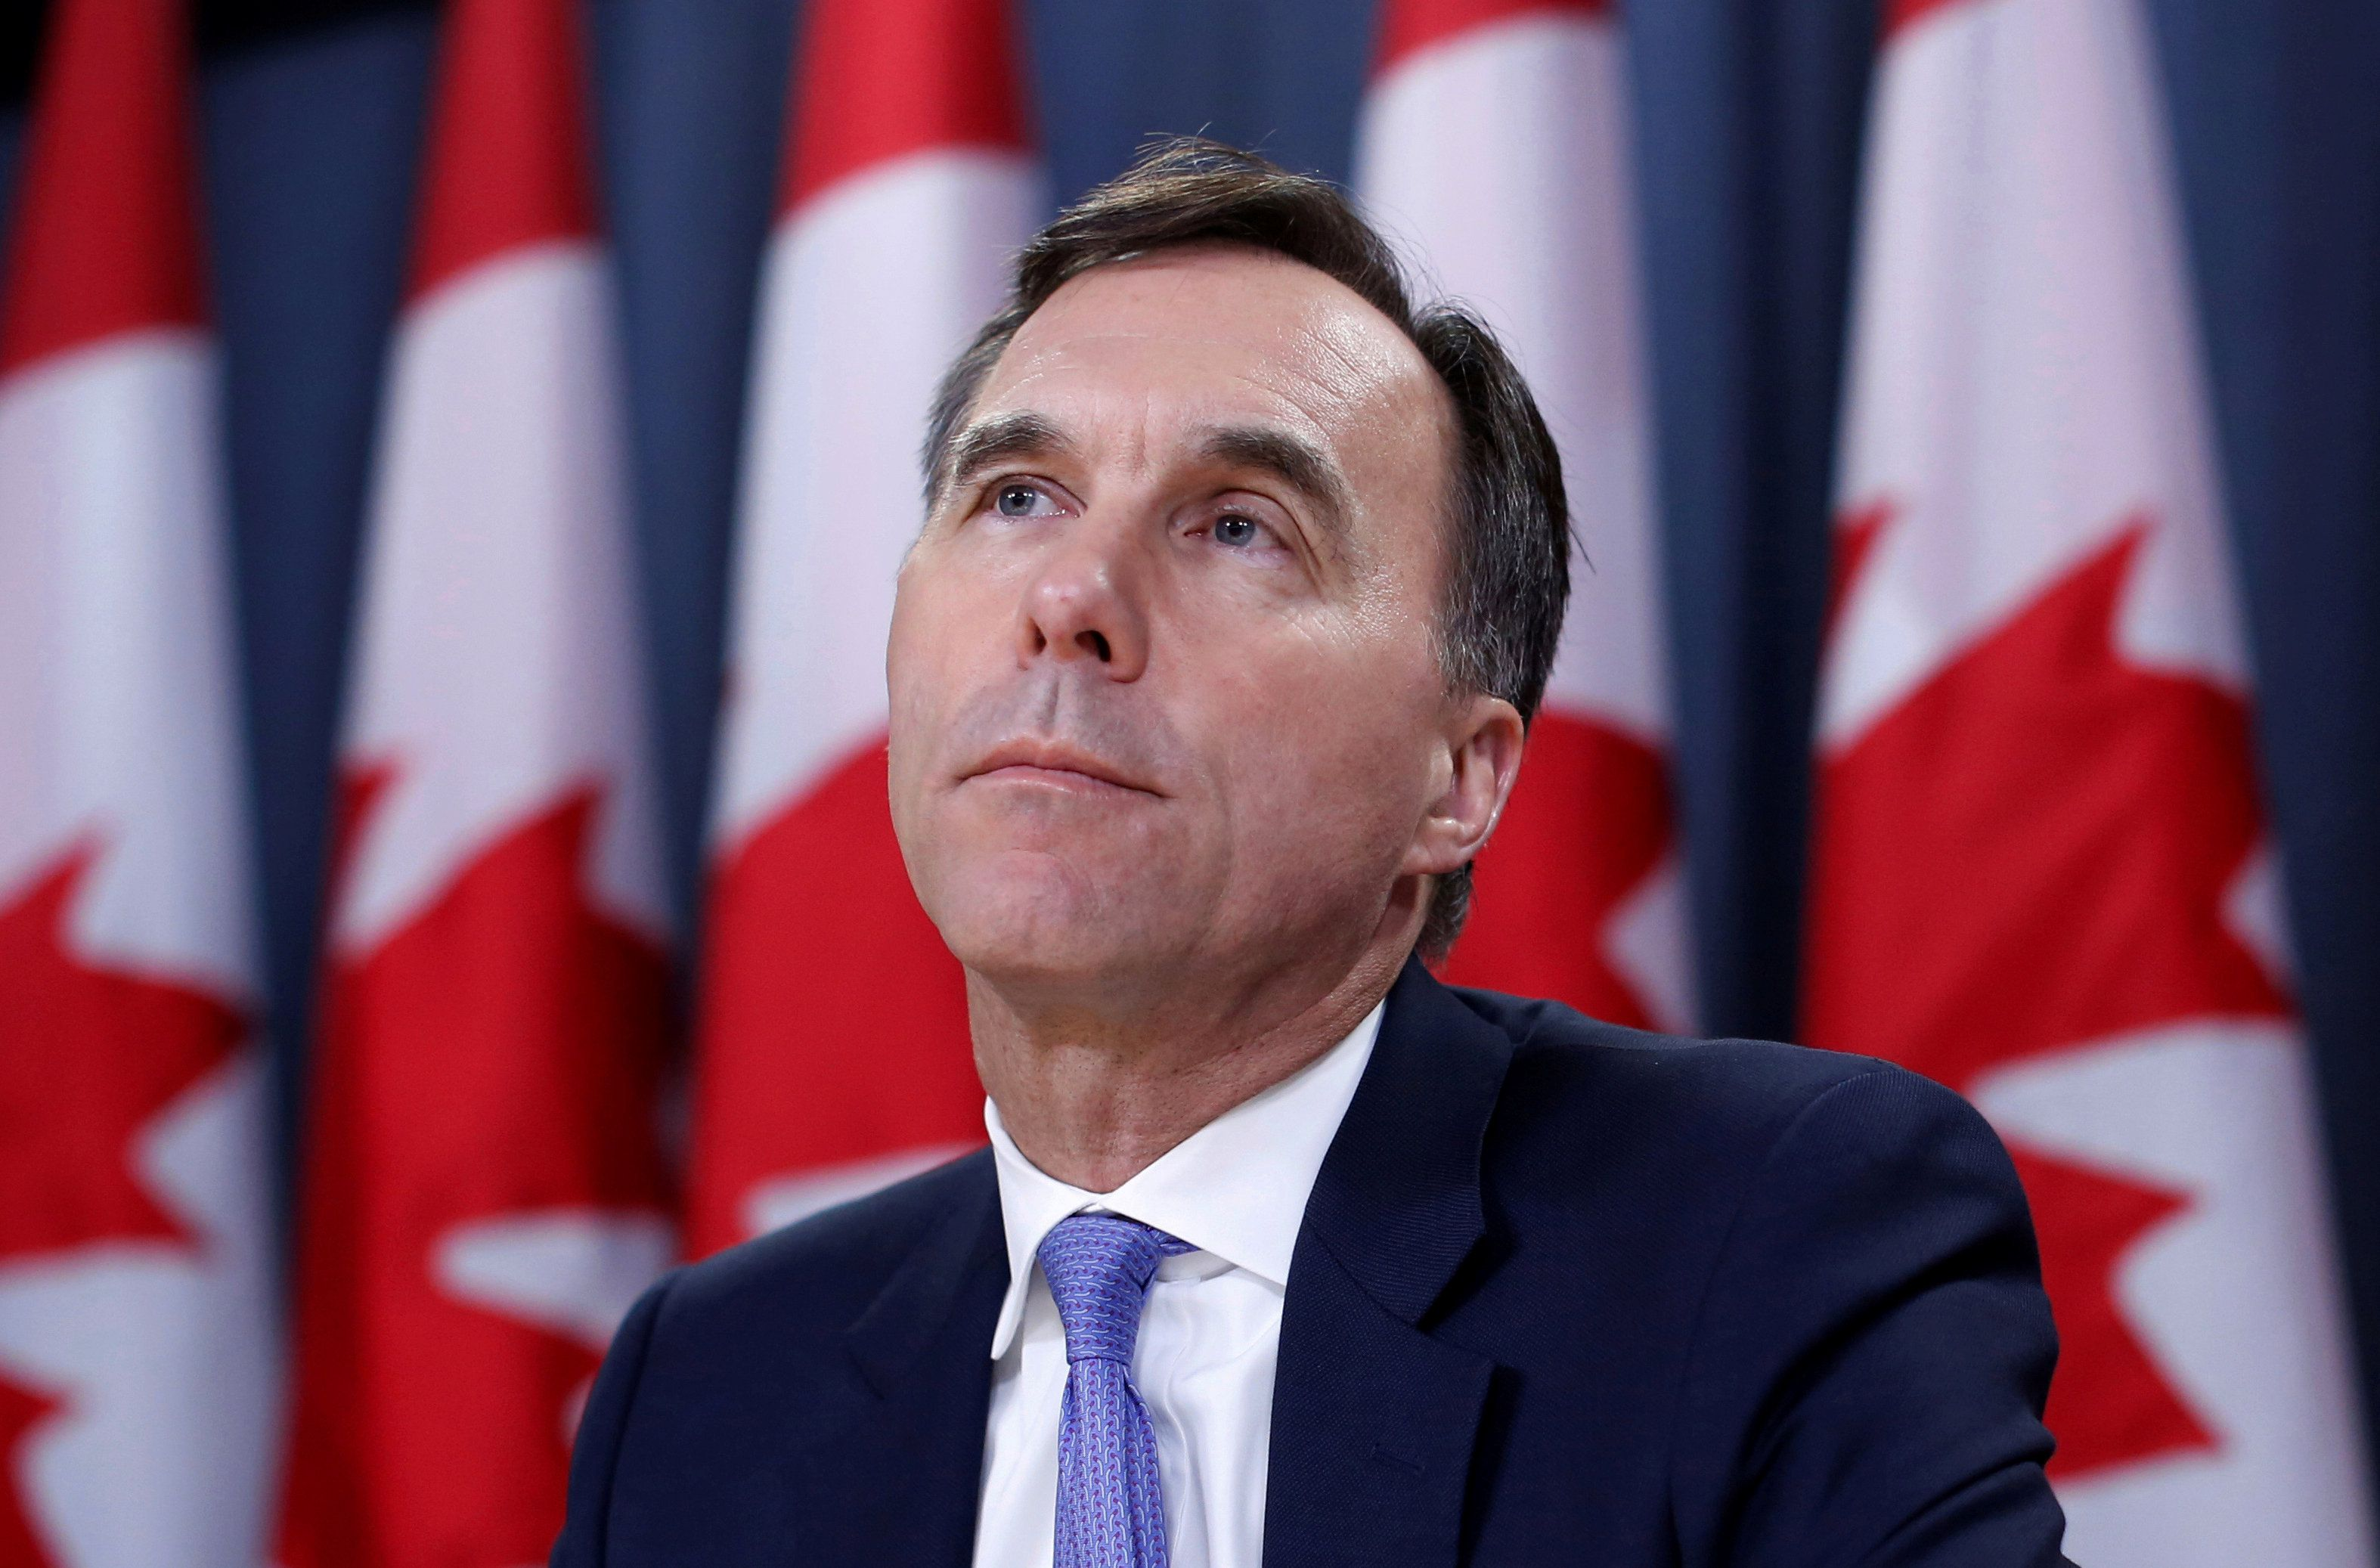 Canada and Mexico optimistic about NAFTA talks despite trade tensions at G20